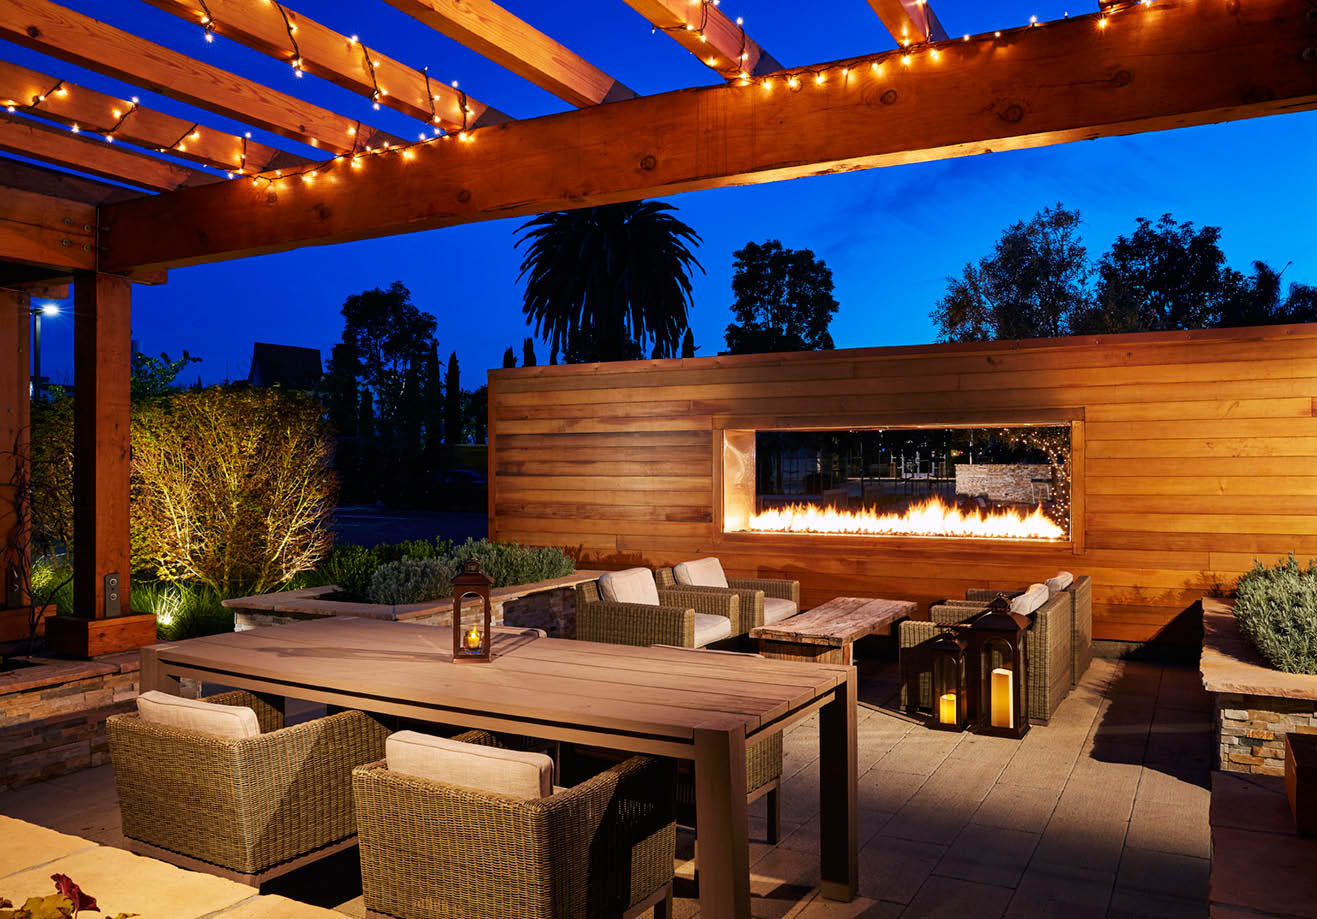 hotel deals near Sunnyvale, CA